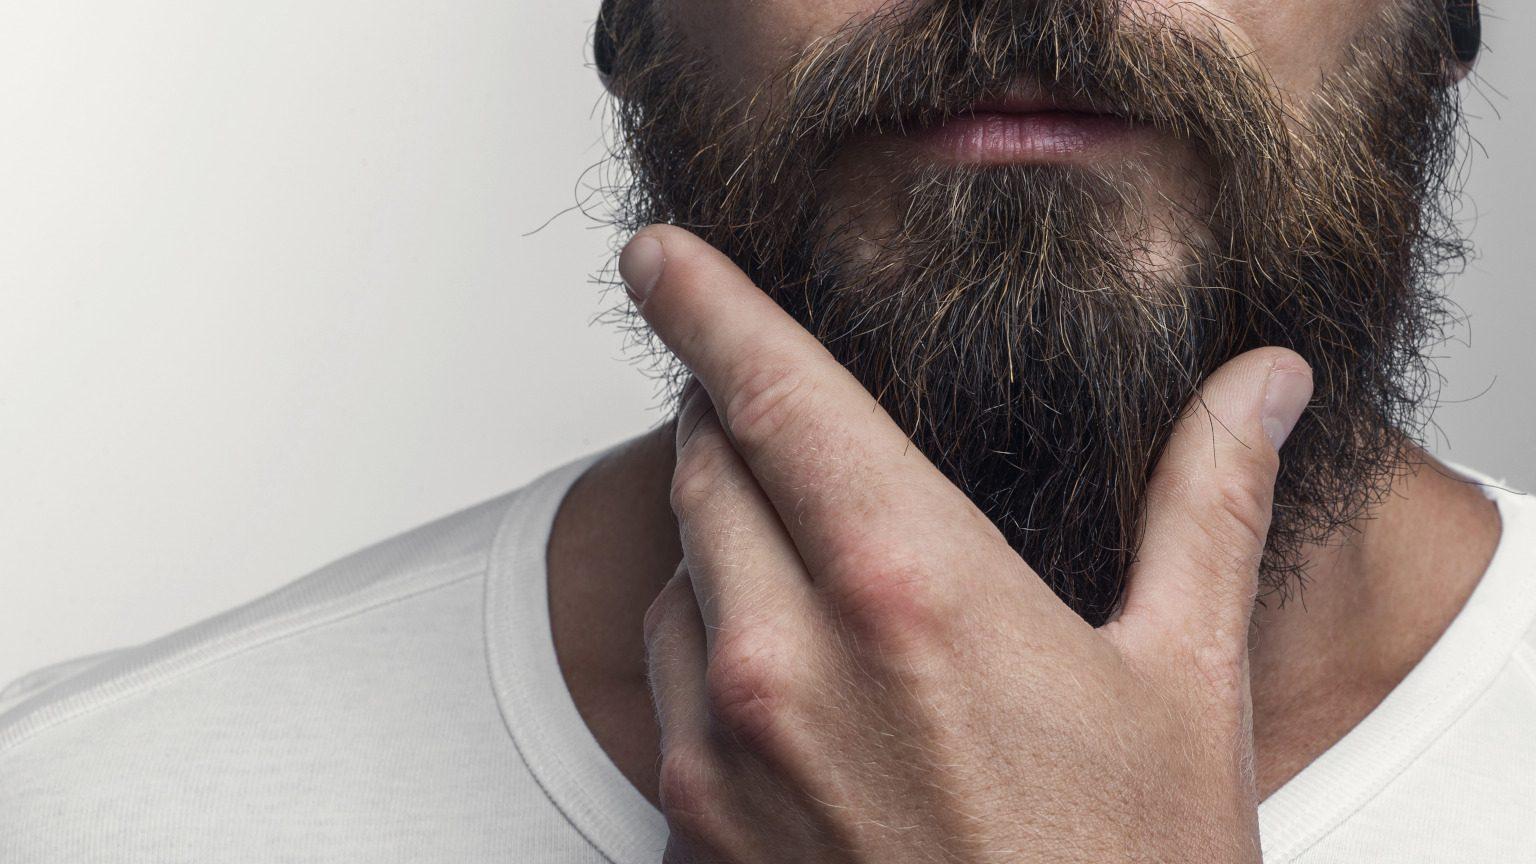 Touching his great beard